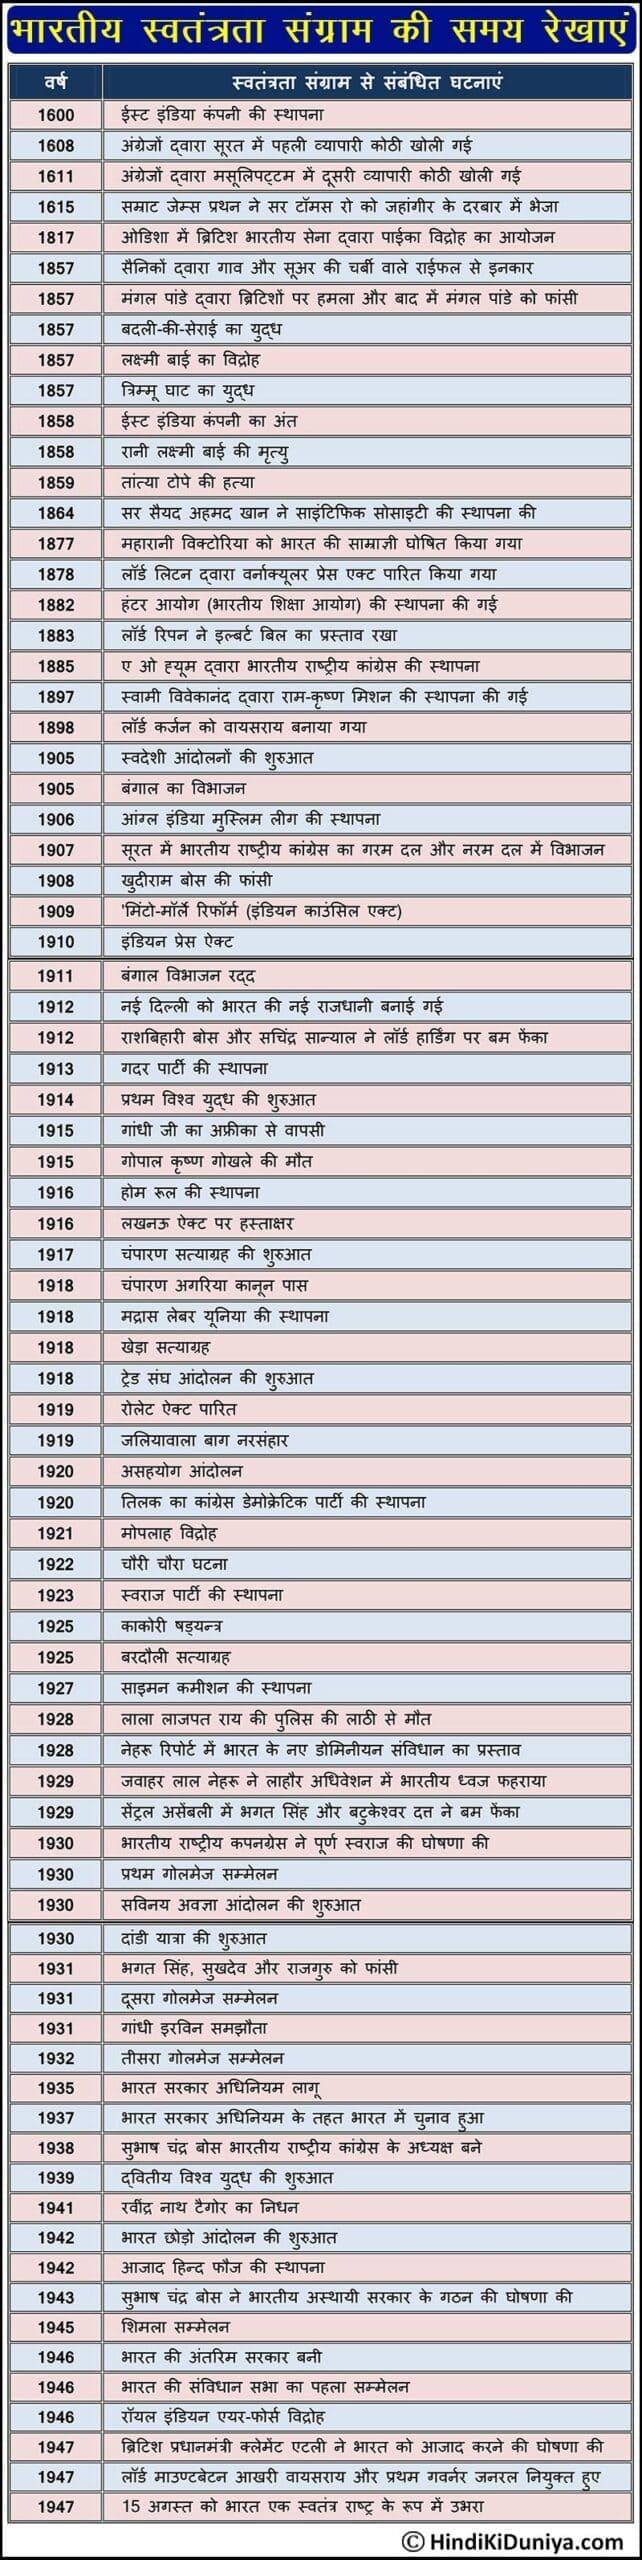 Timelines of Indian Freedom Struggle